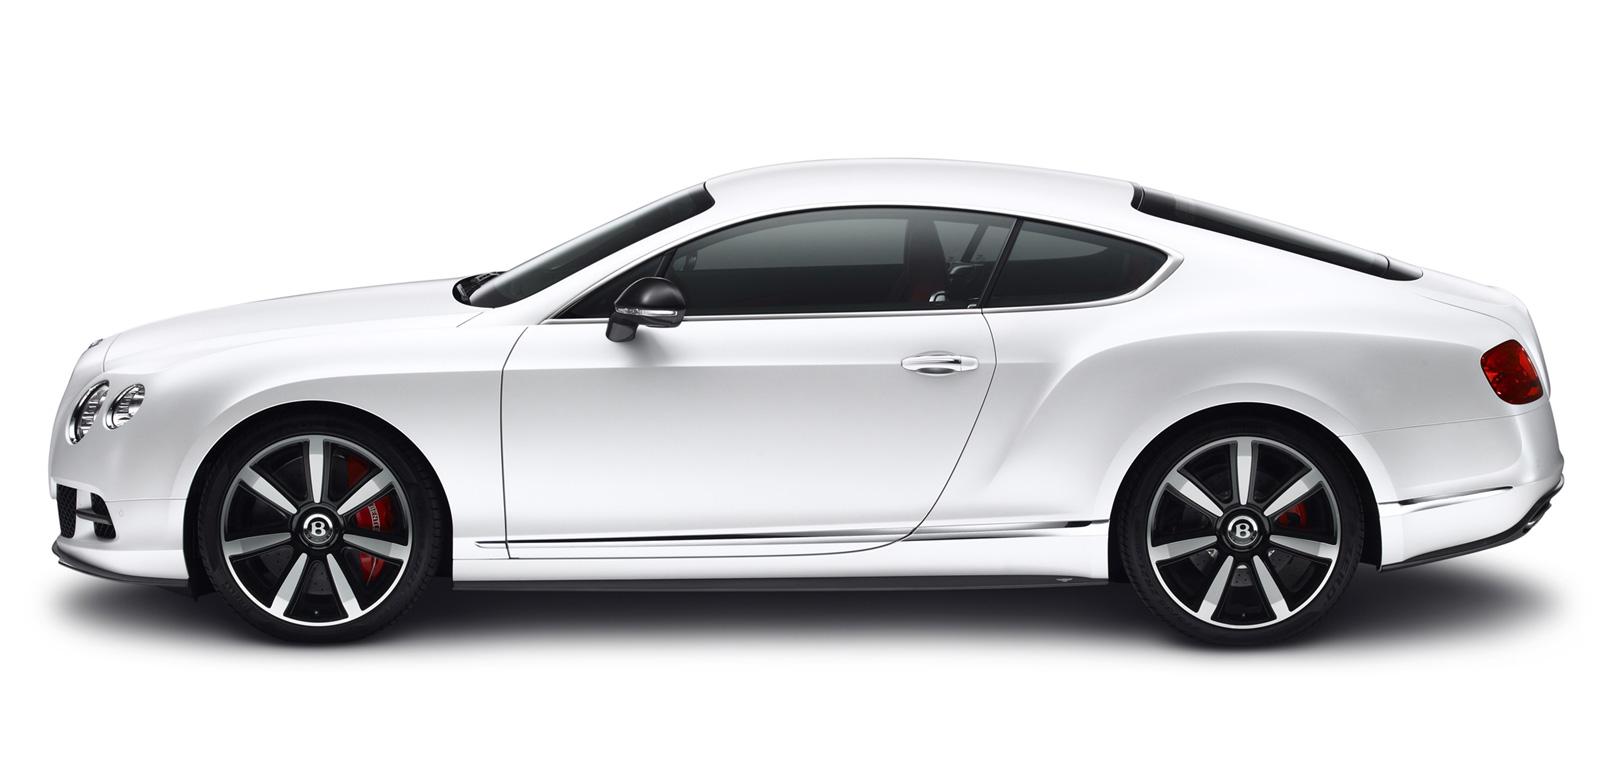 "Black Paintetd 21"" Alloy Wheel Option Enhances Sporting Look"